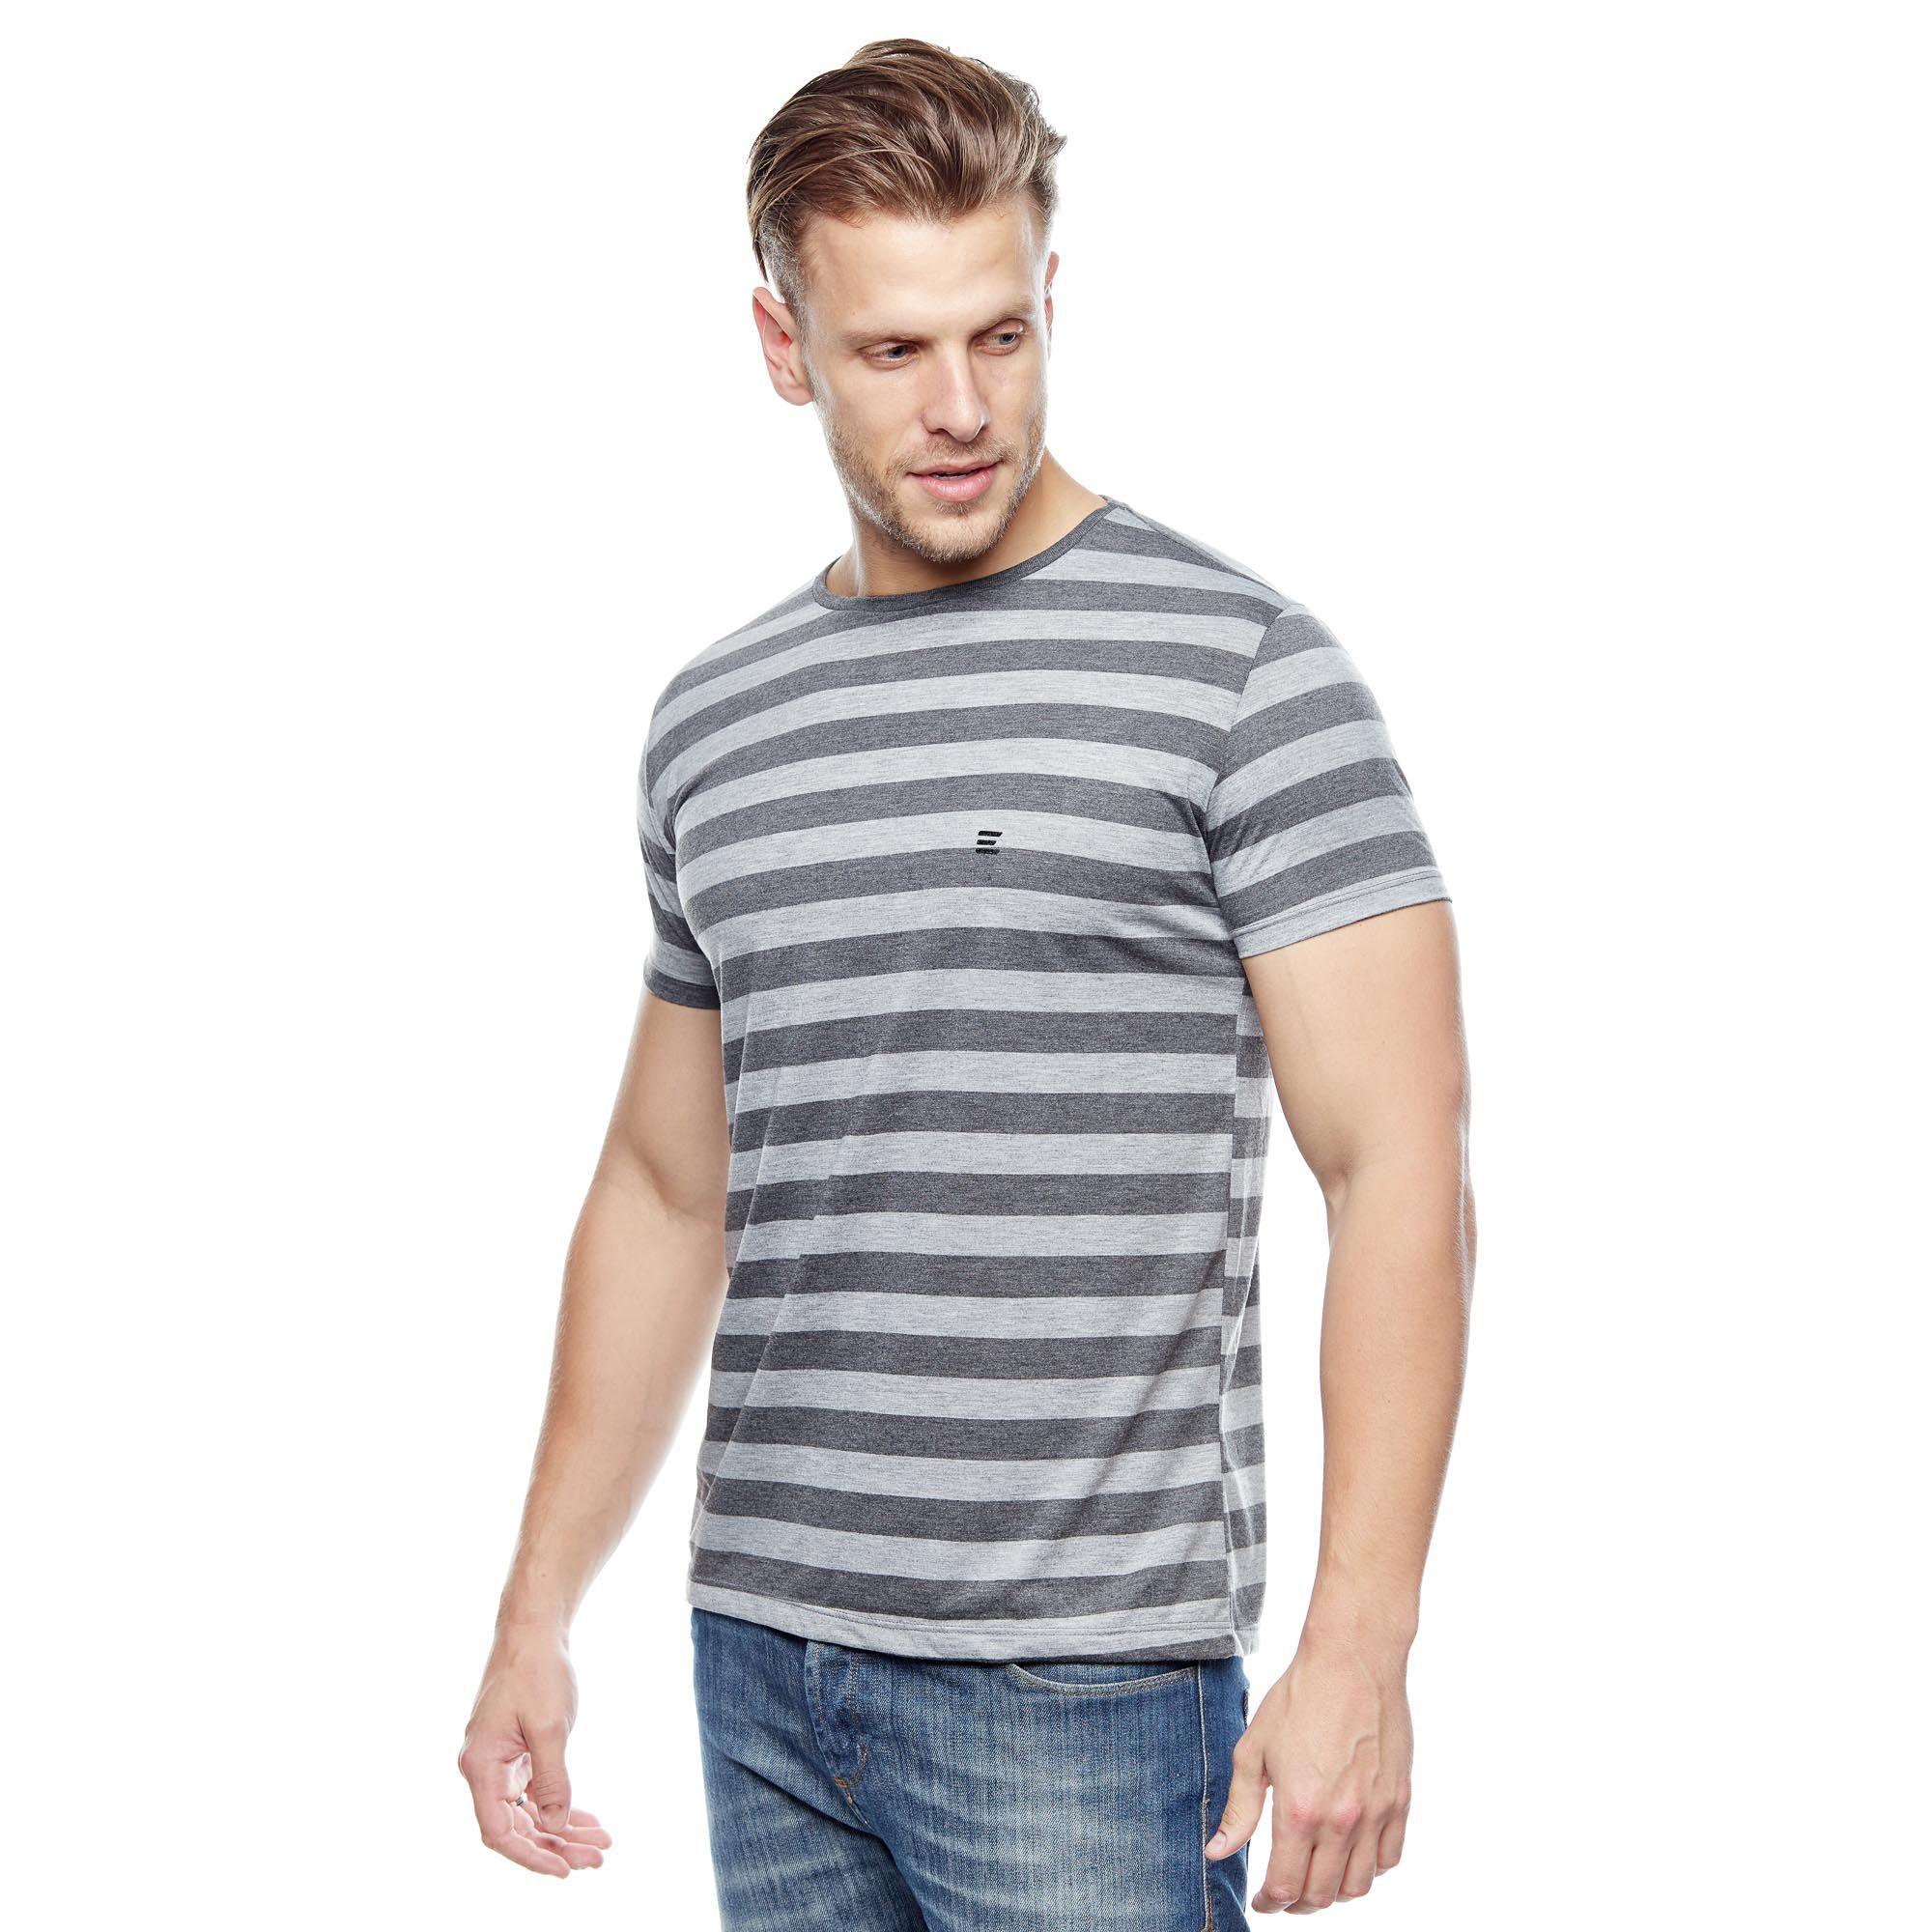 Camiseta Básica Gray Stripes Masculina Evolvee